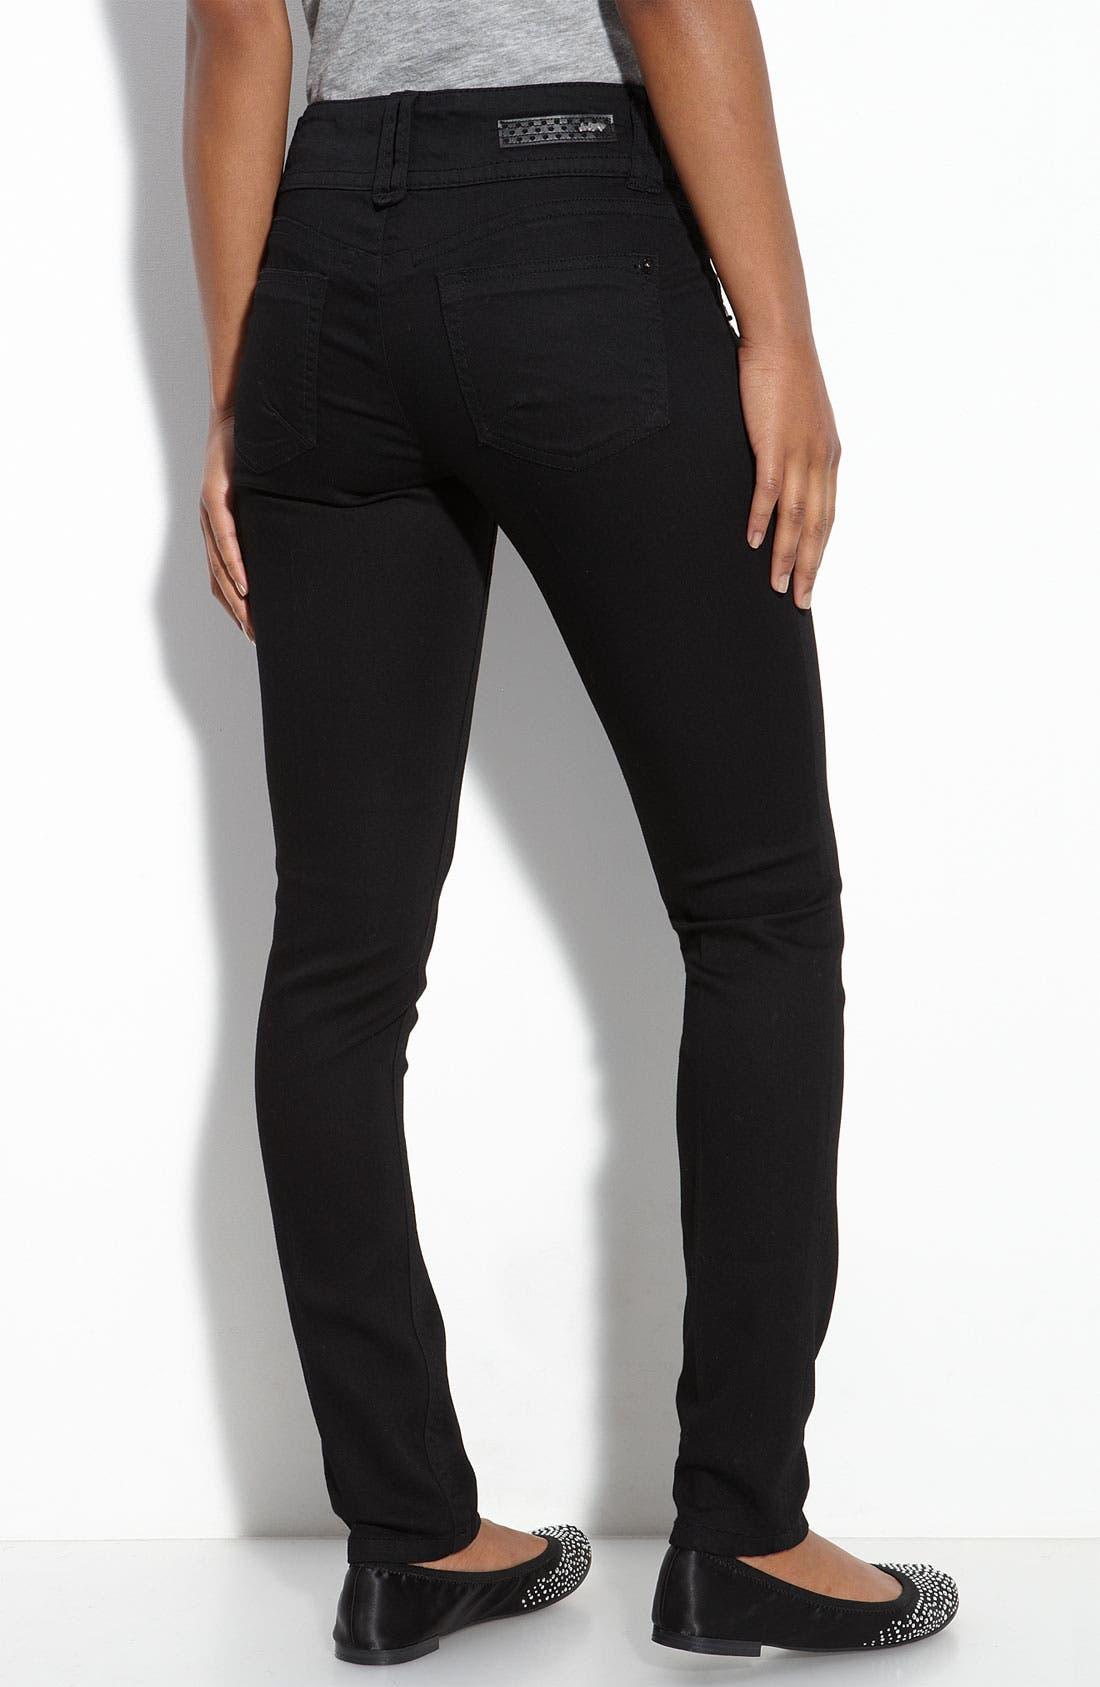 Alternate Image 1 Selected - Jolt Double Button Skinny Denim Pants (Black Wash) (Juniors)